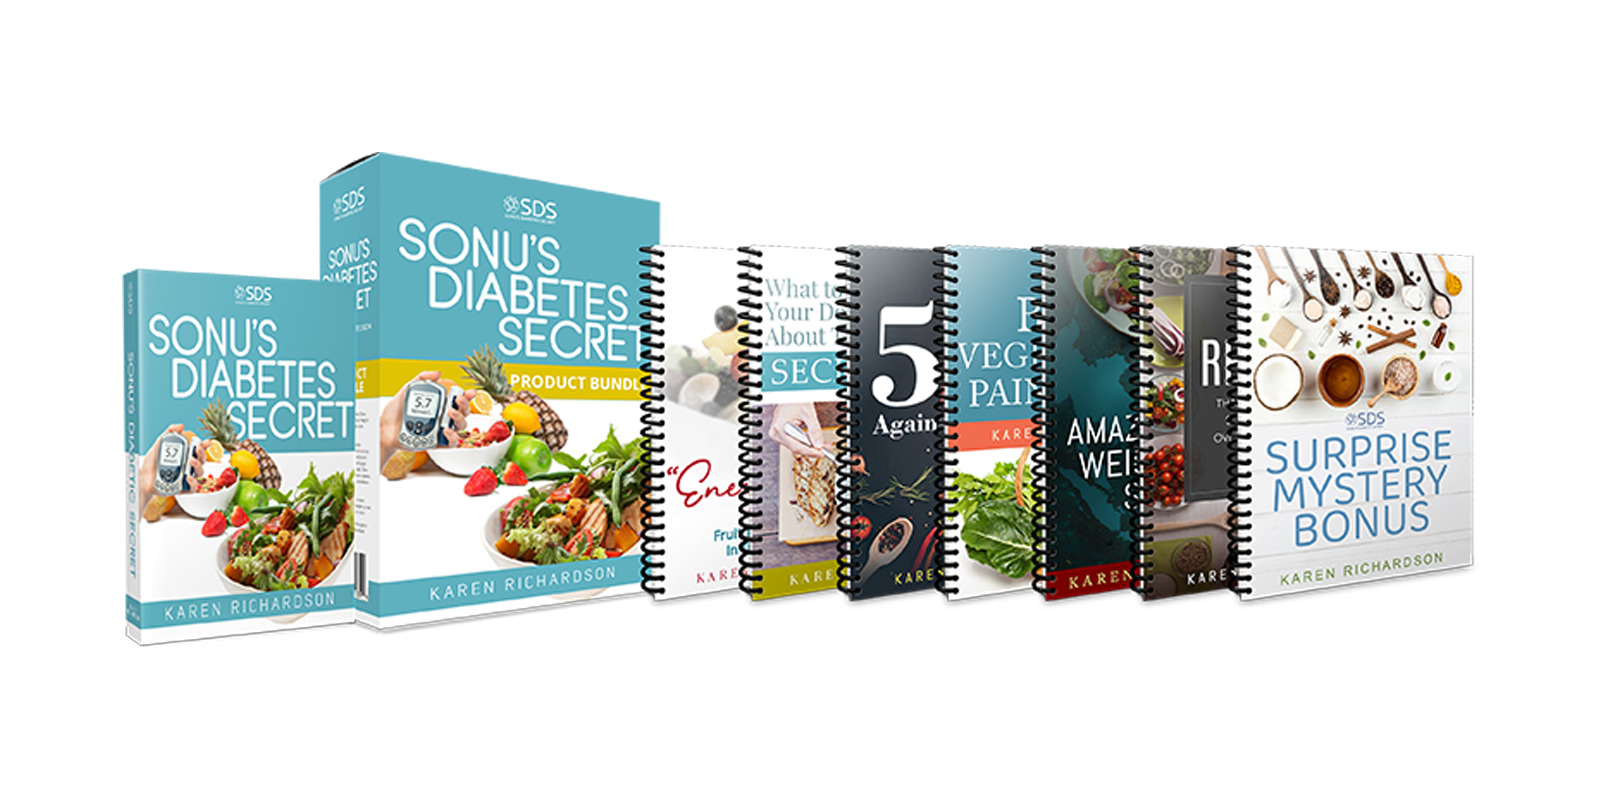 Sonu's Diabetes Secret bonuses